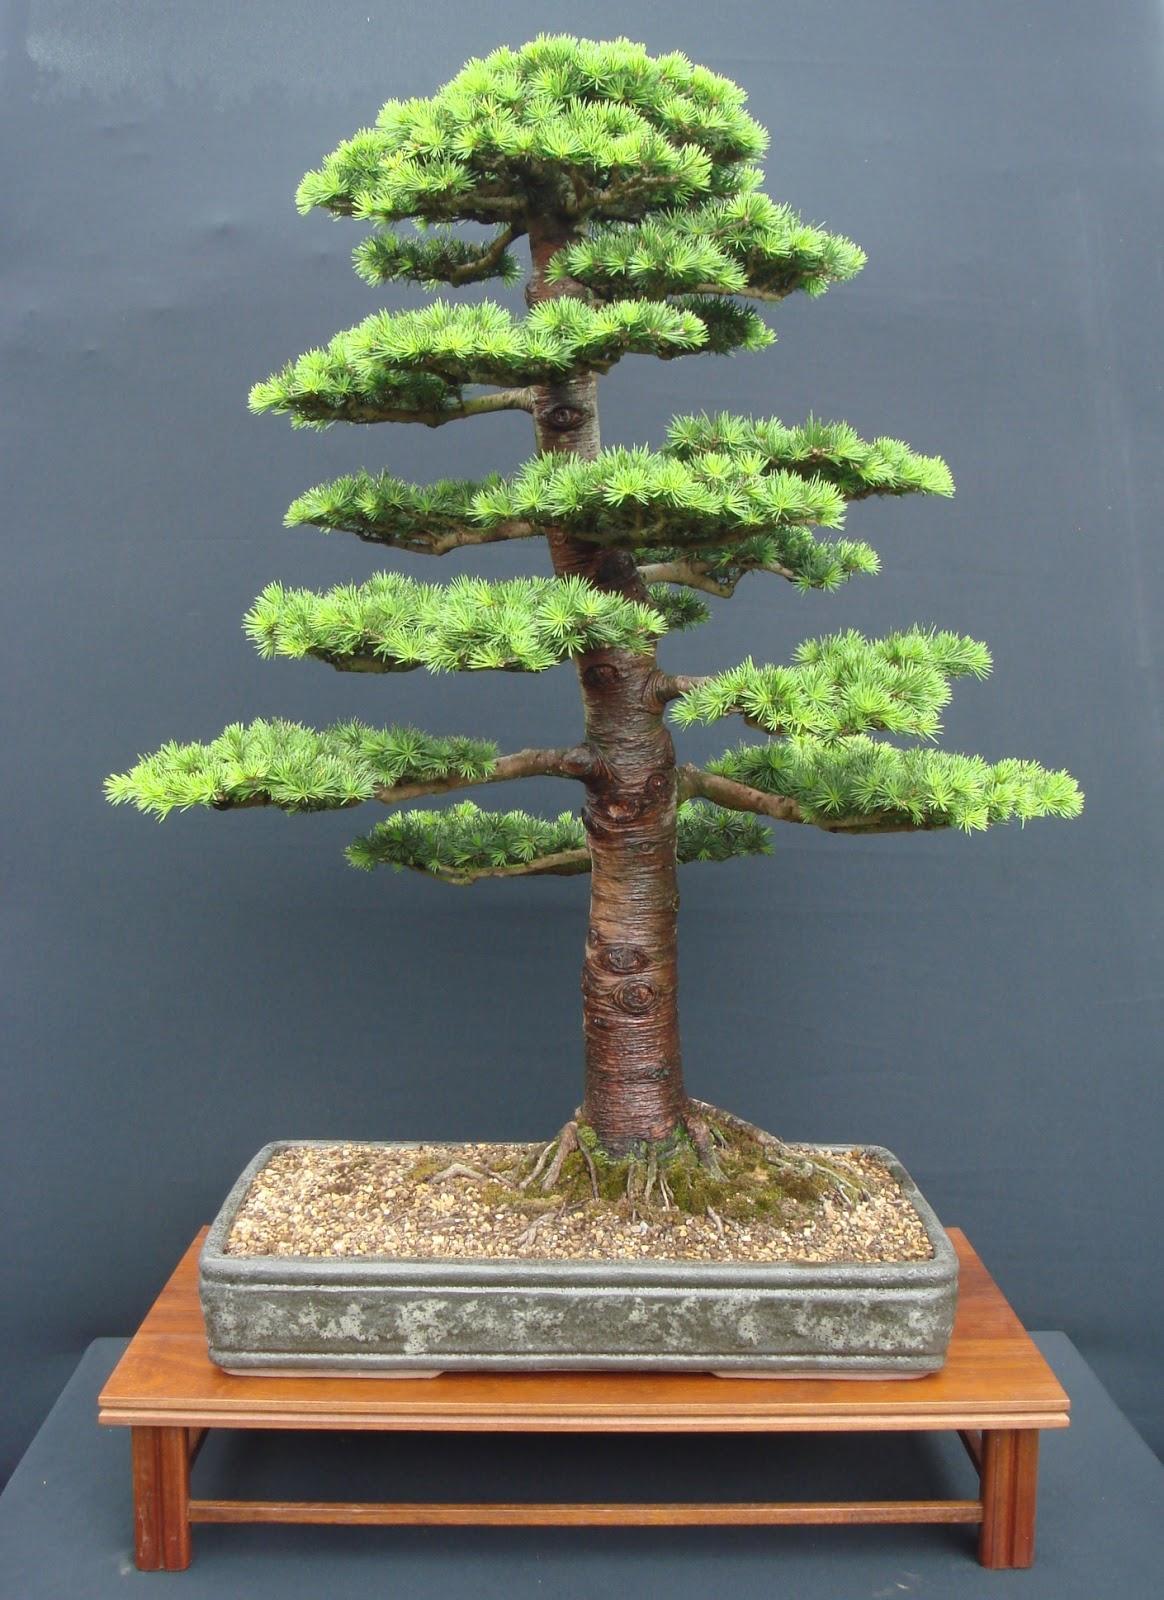 Trees Planet Cedrus Libani Cedar Of Lebanon